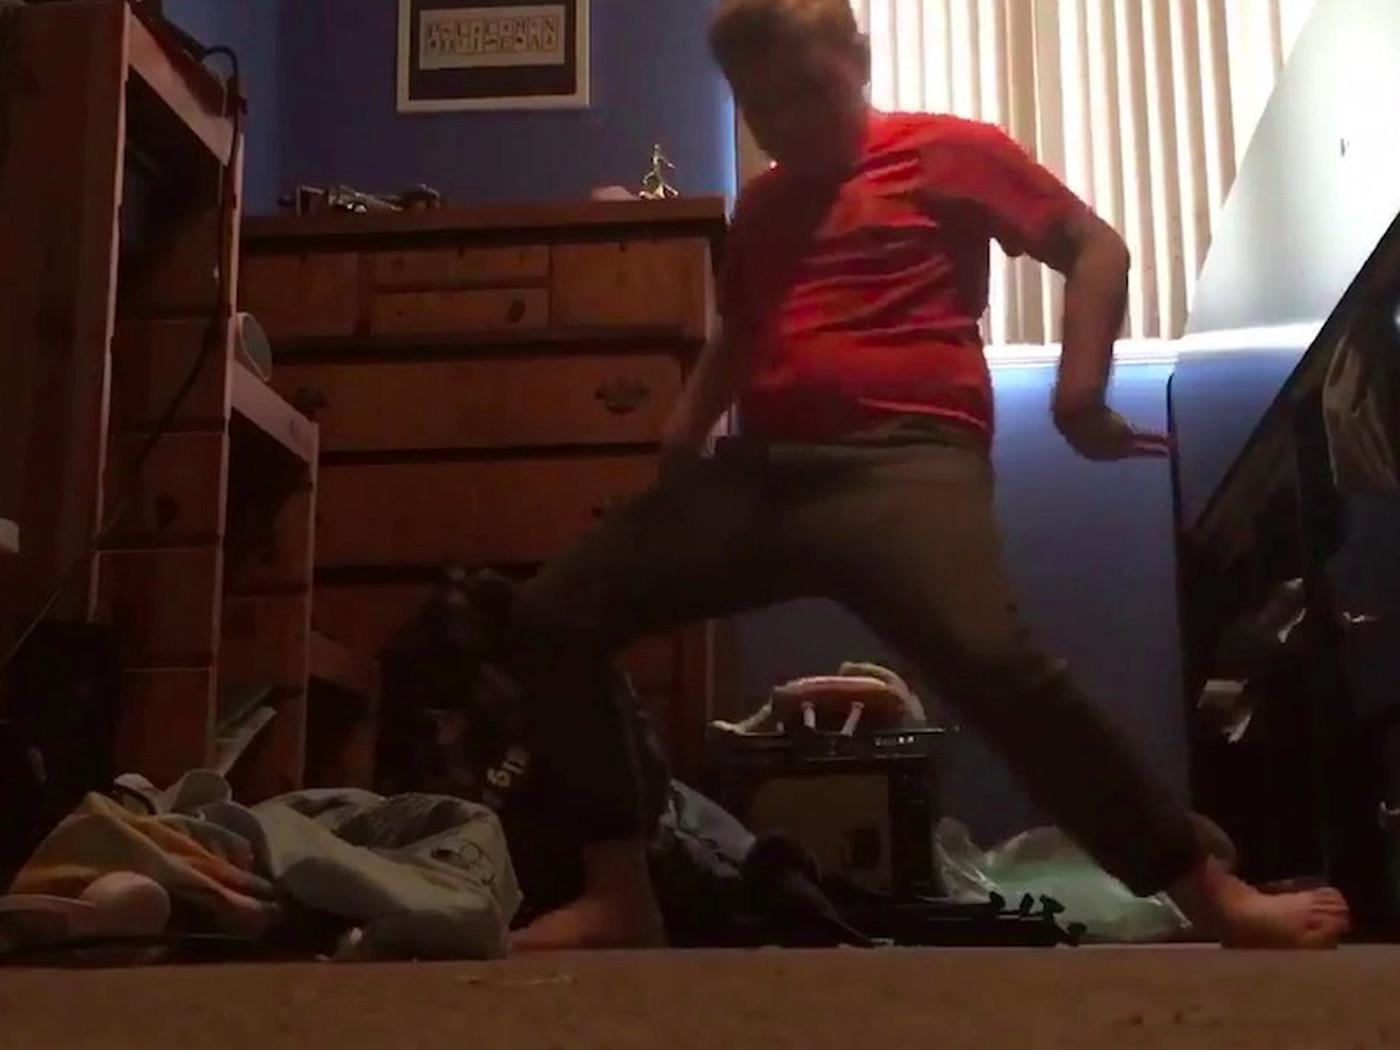 Fortnite S Orange Shirt Kid Gets Justice After New Dance Added To